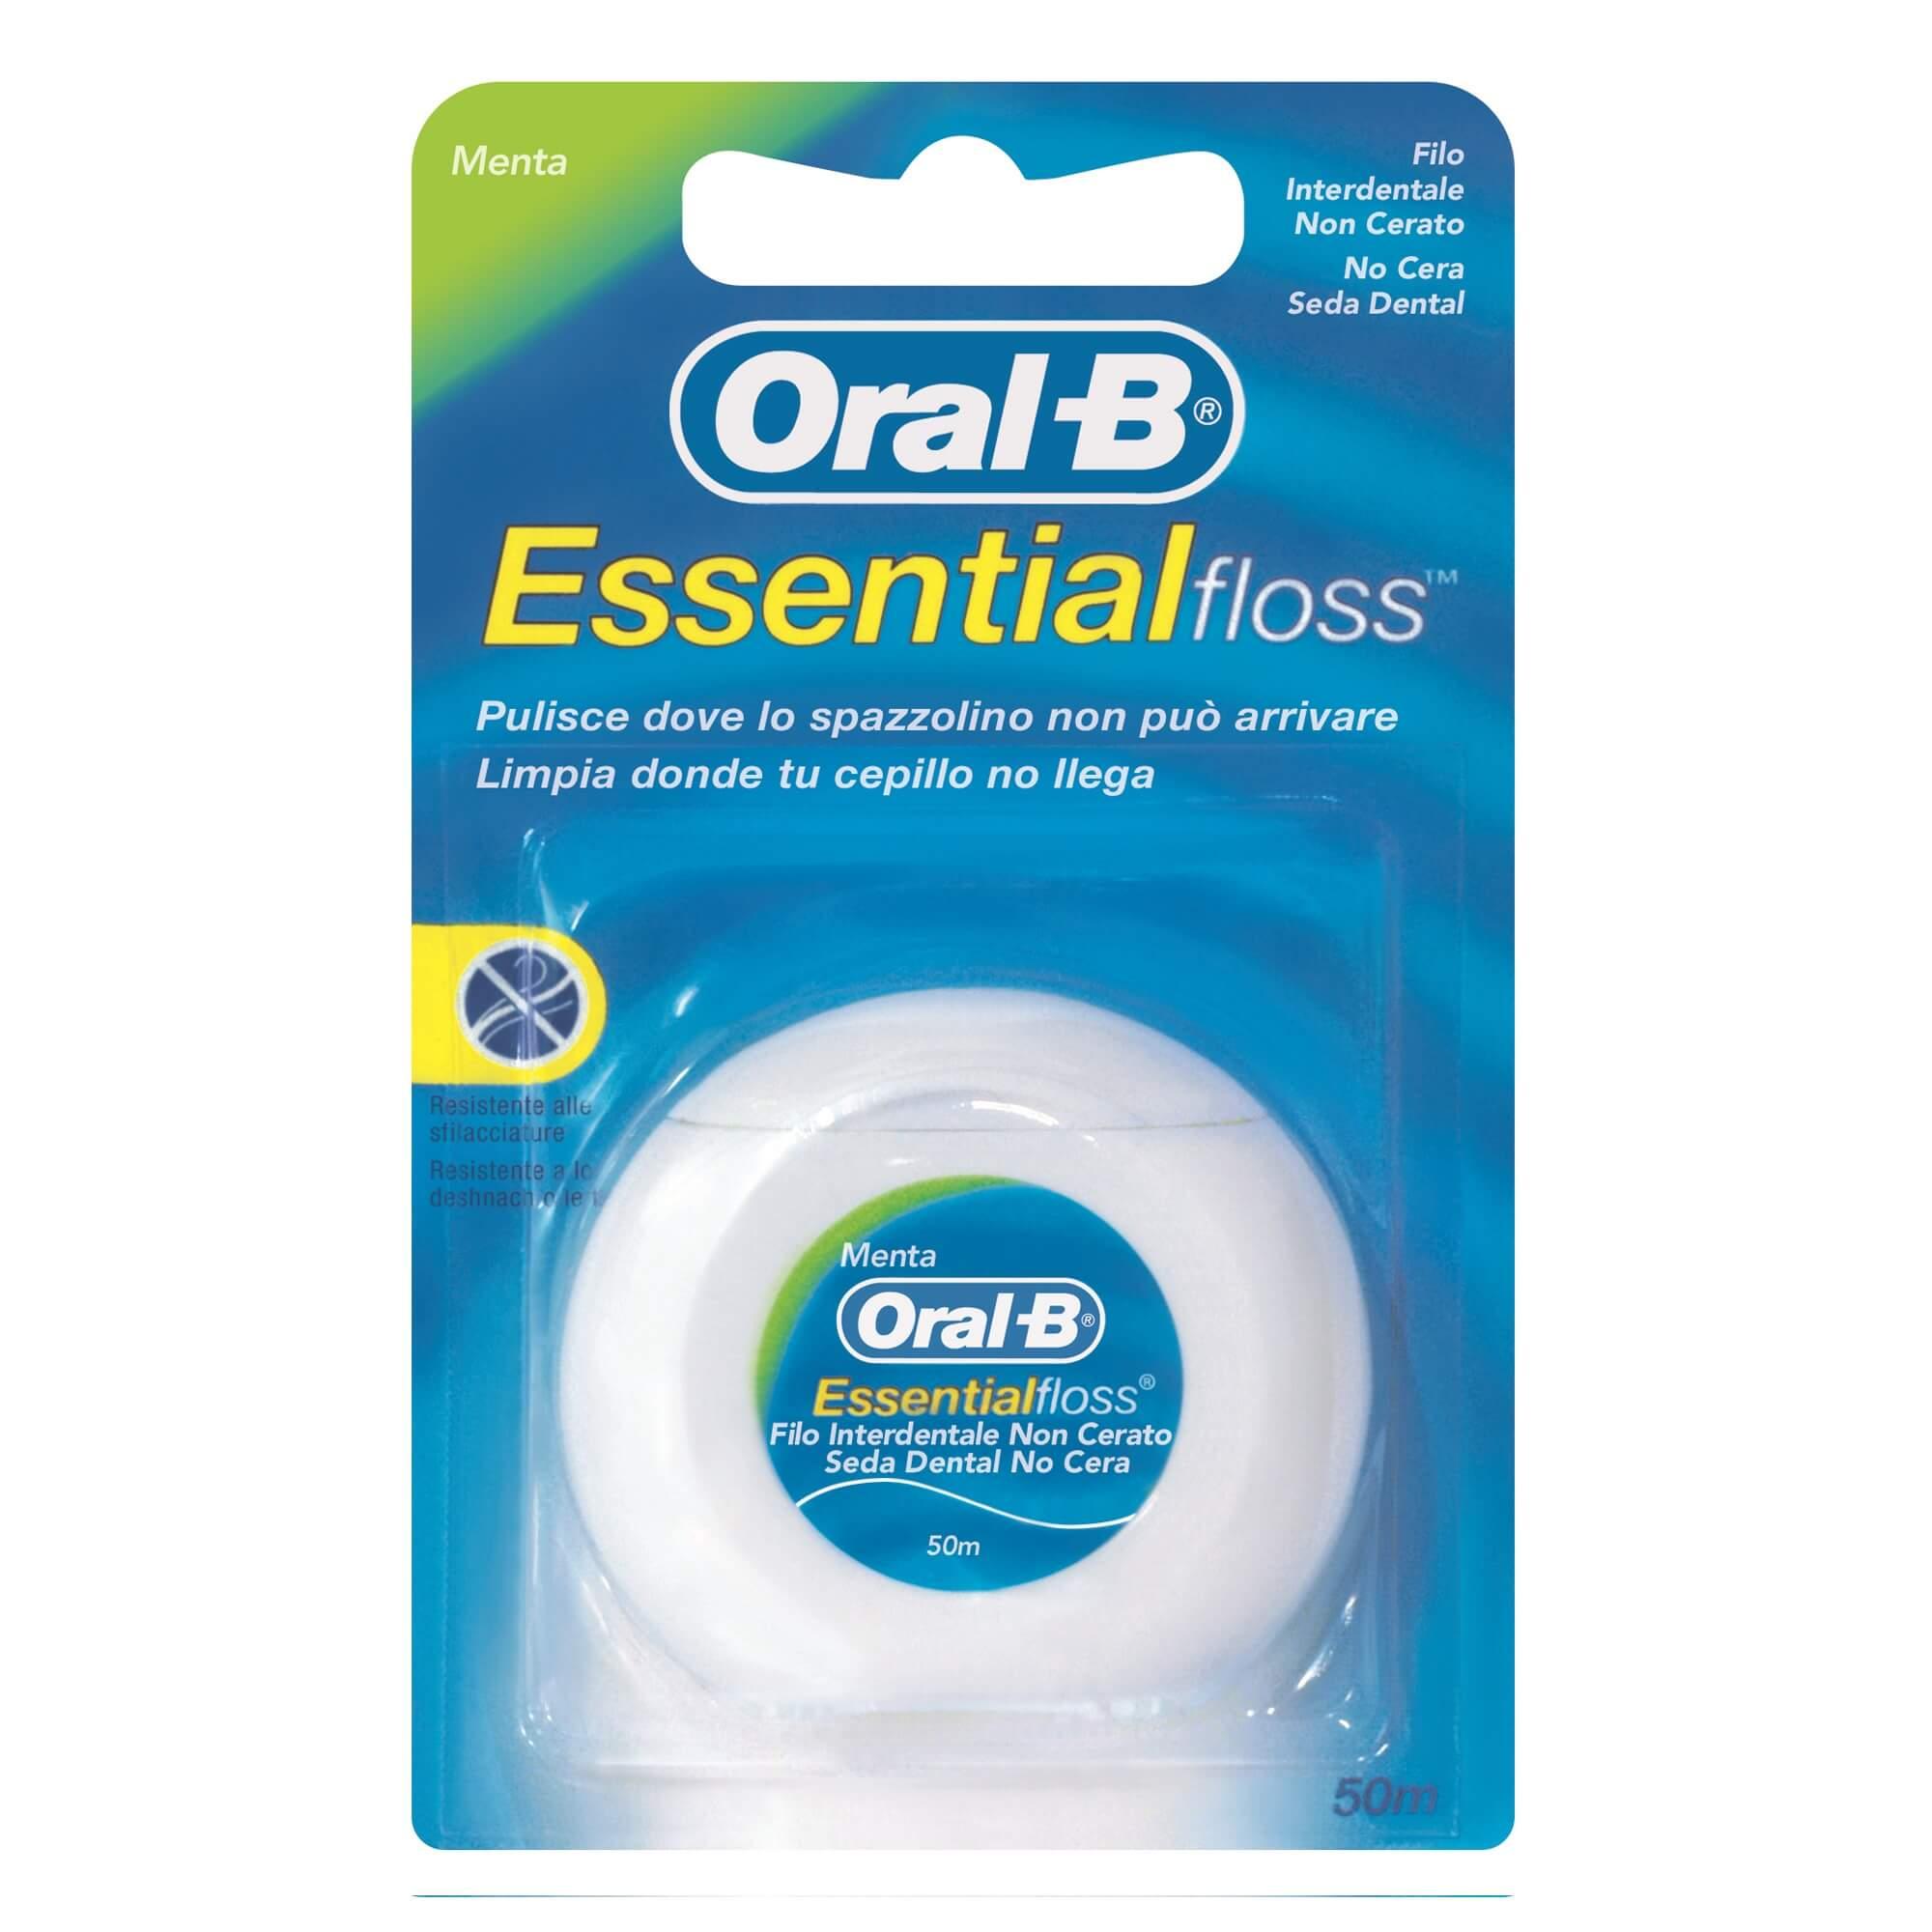 Зубная нить Oral-B Essential Floss, 50 м.